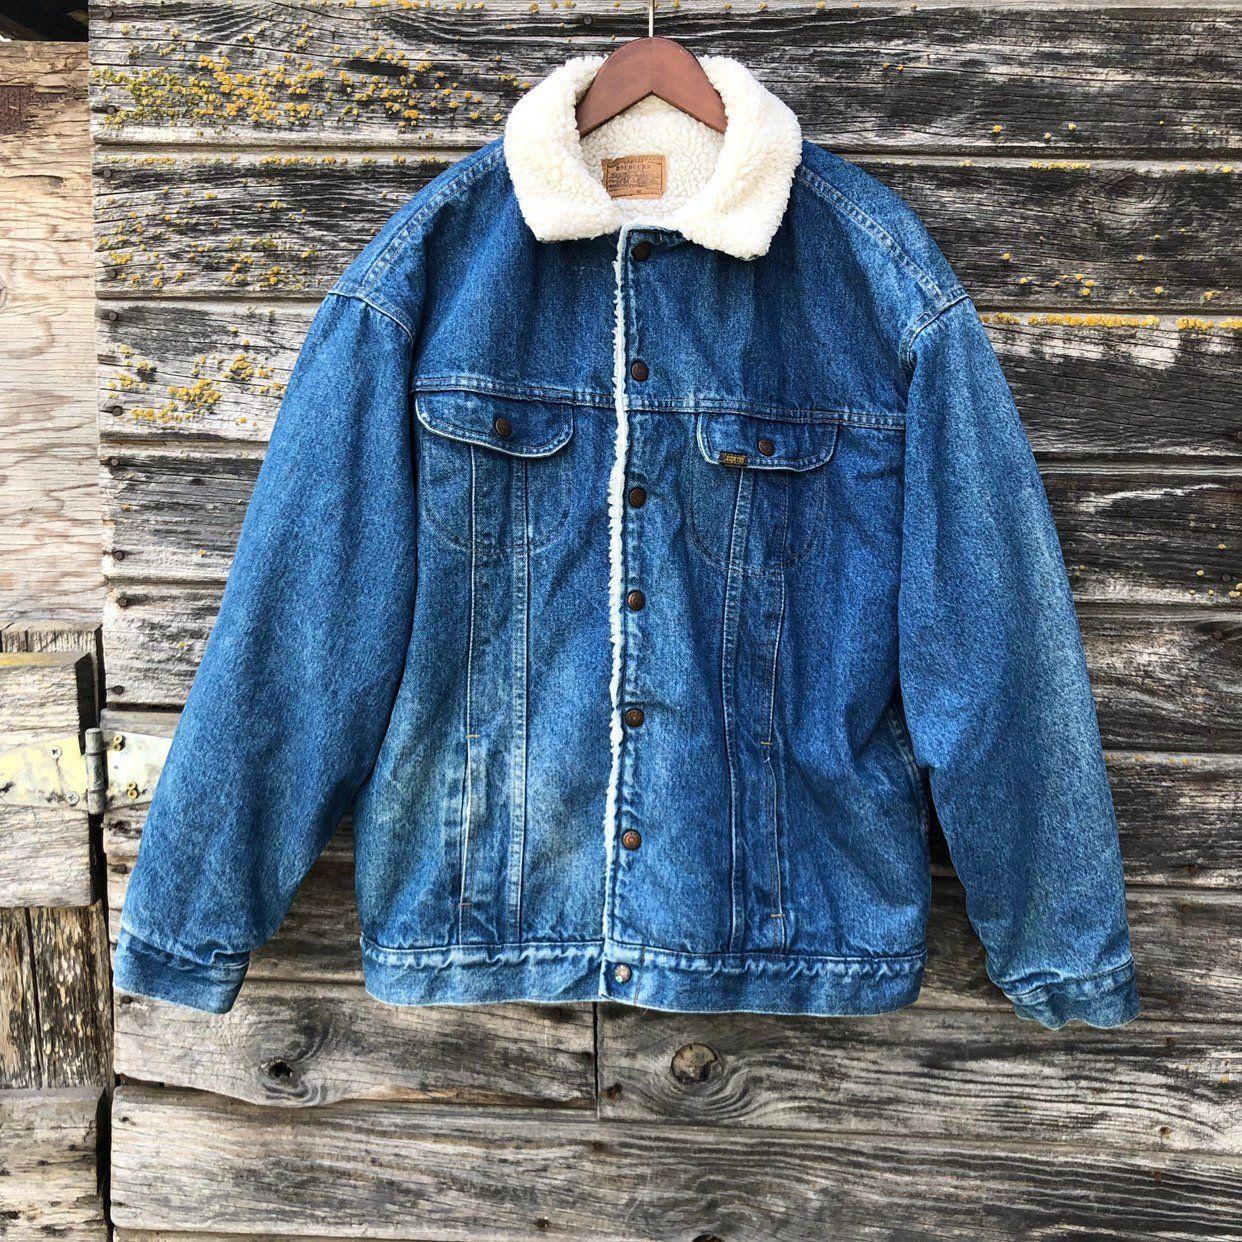 b864f5acfb4 Vintage sherpa denim jacket Sears Roebuck jean jacket faded blue distressed  rustic grunge coat 70s biker western chore jacket men L XL 52